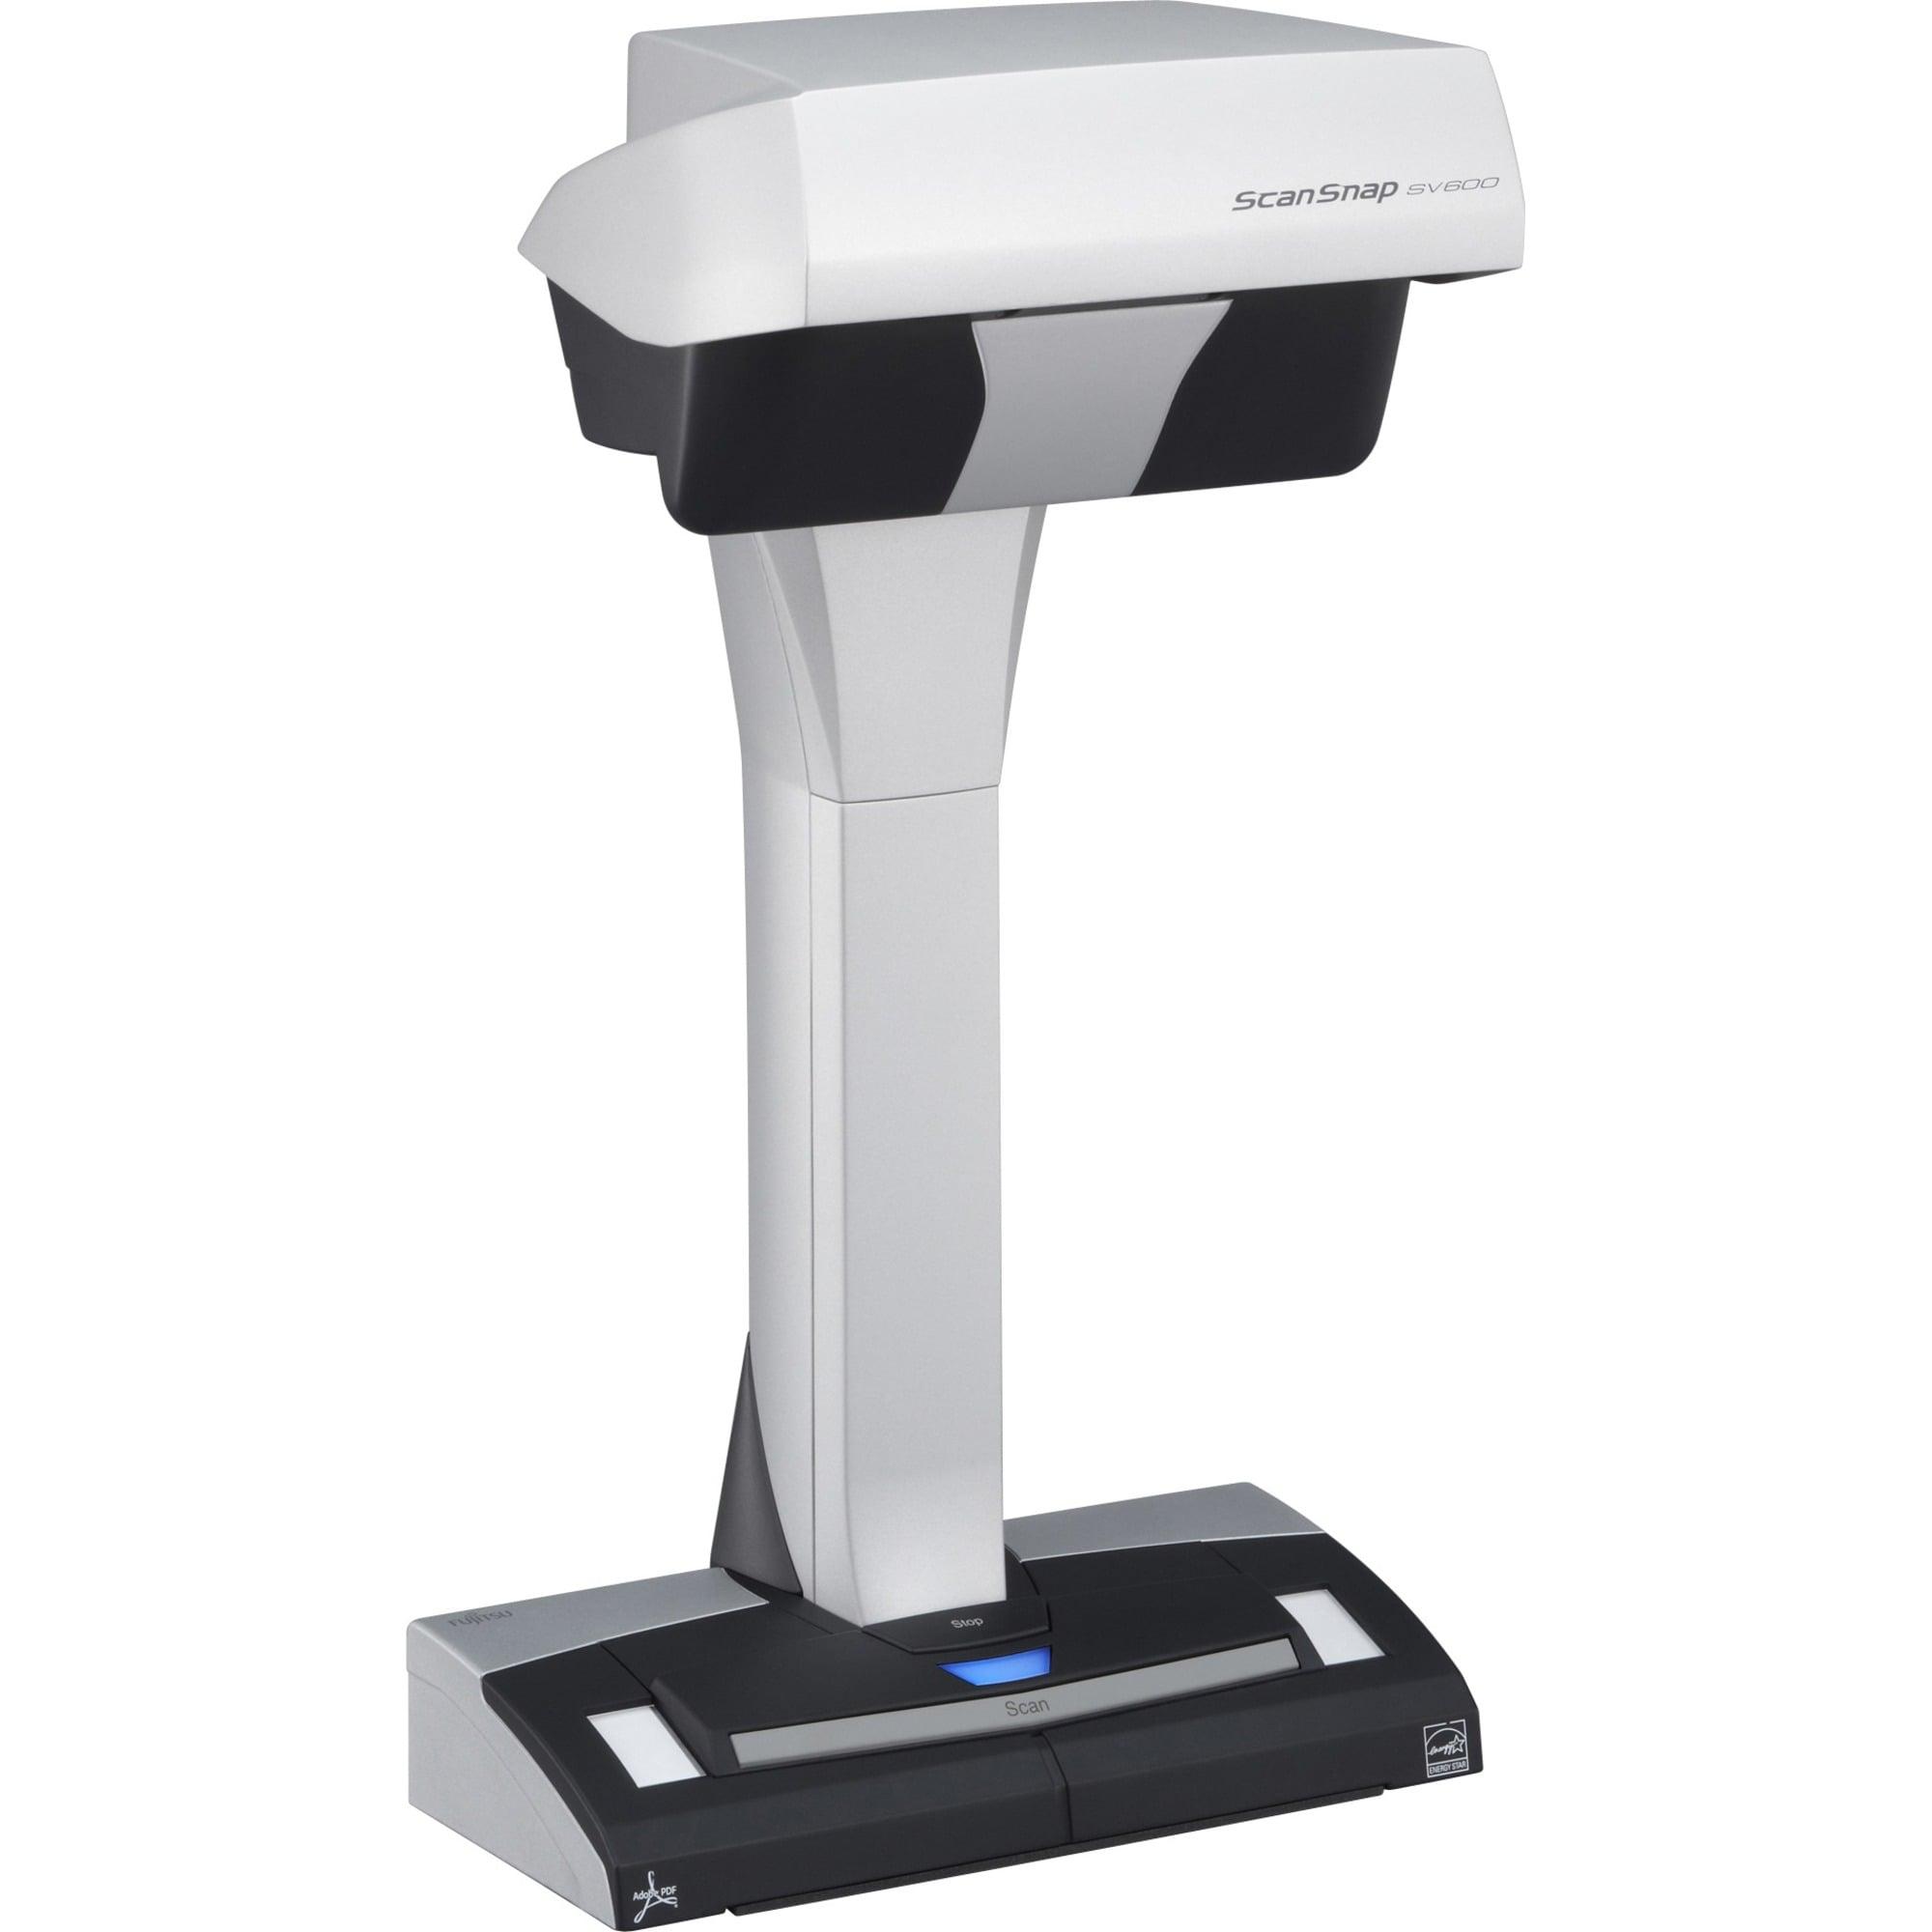 Fujitsu ScanSnap SV600 Overhead Scanner - 1200 dpi Optica...